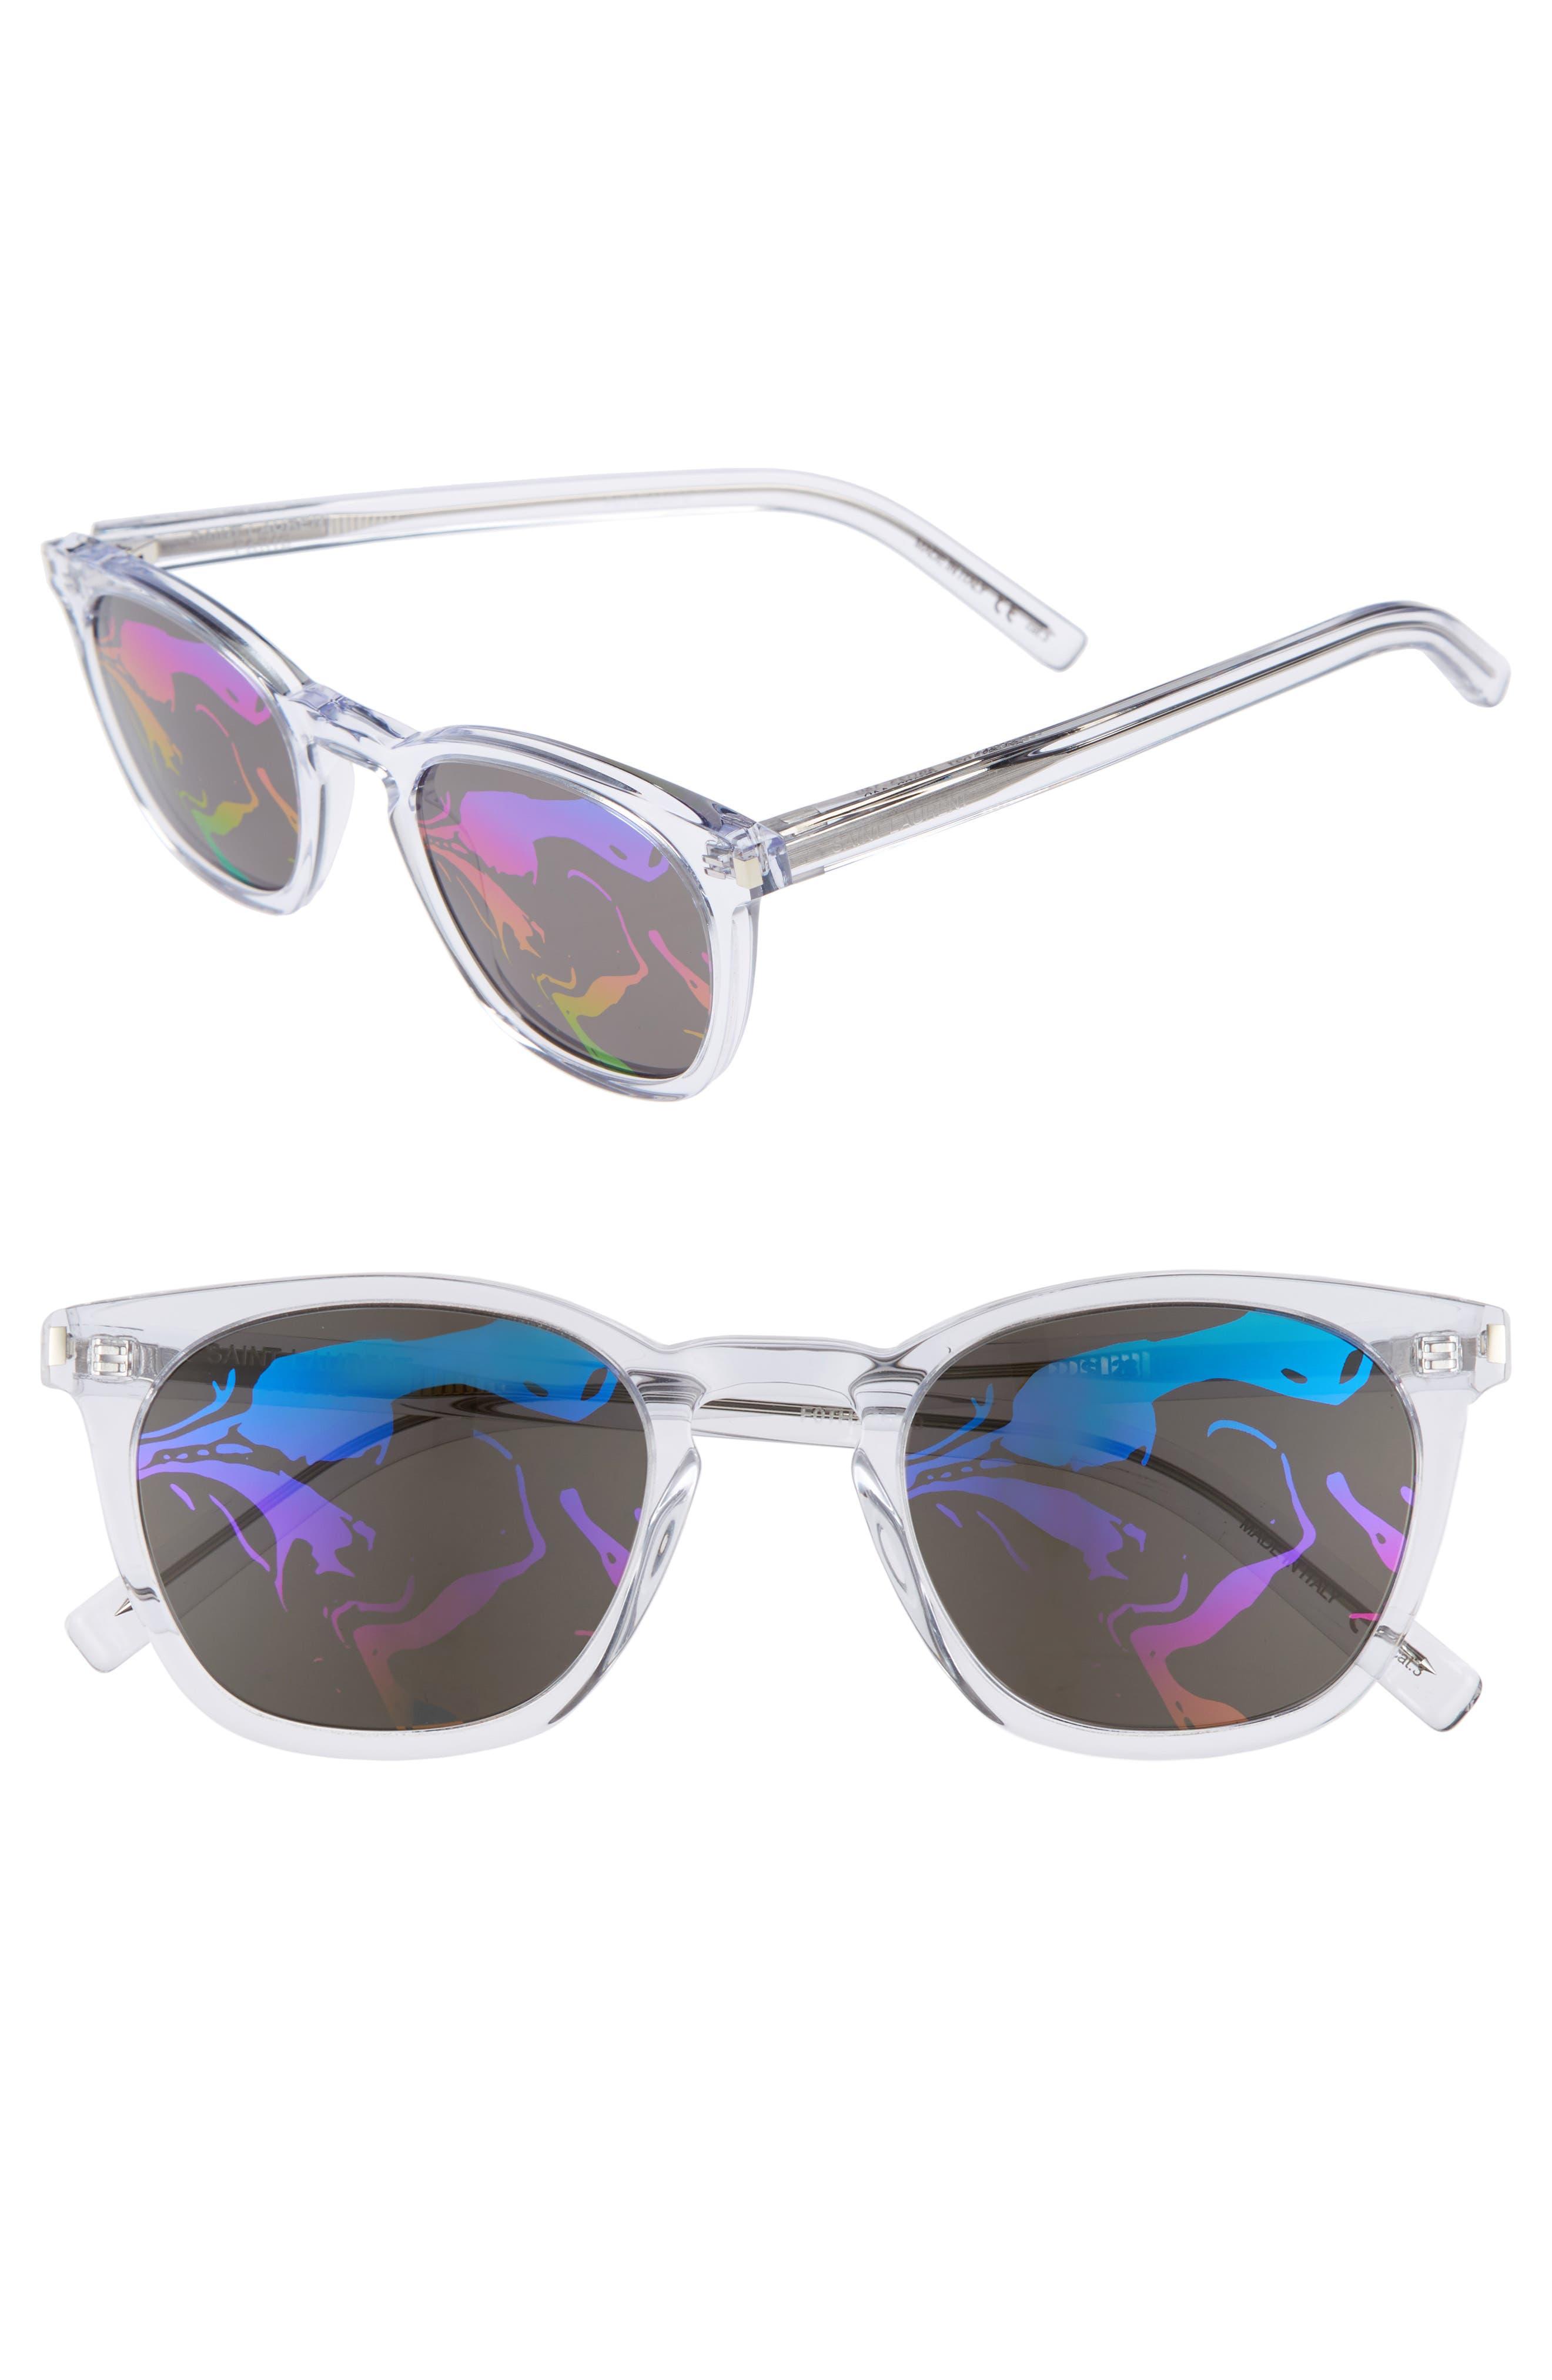 Main Image - Saint Laurent SL28 49mm Sunglasses